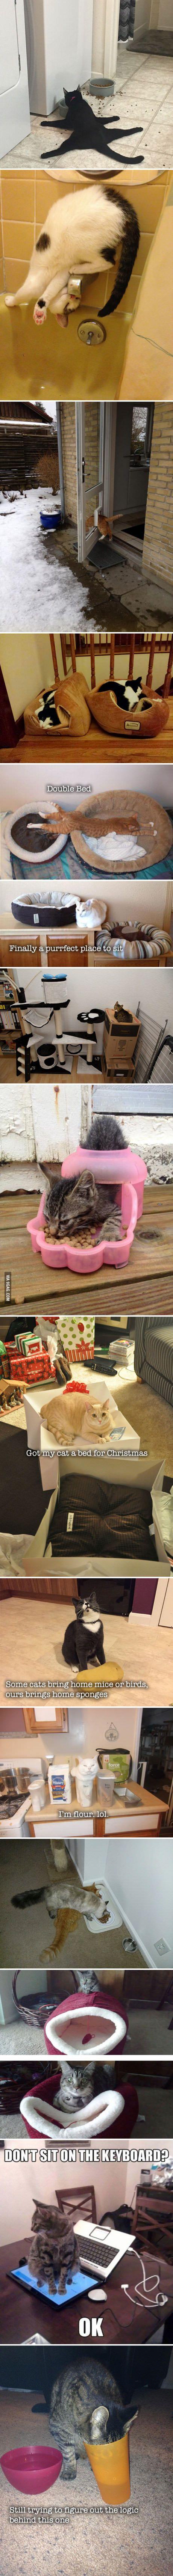 15 Hilarious Examples Of Cat Logics